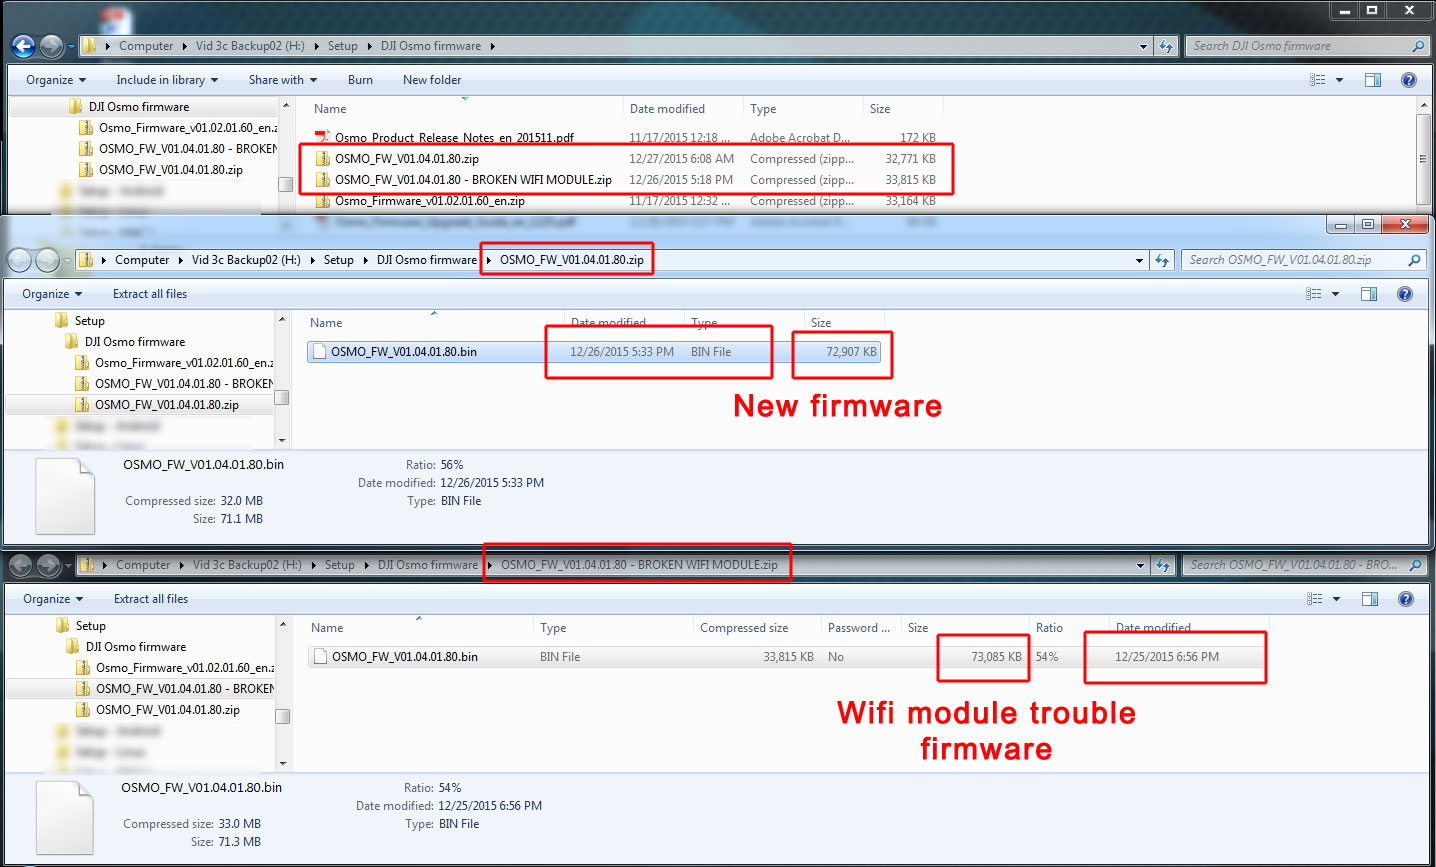 DJIOsmoFirmware-01-04-01-80-differences.jpg